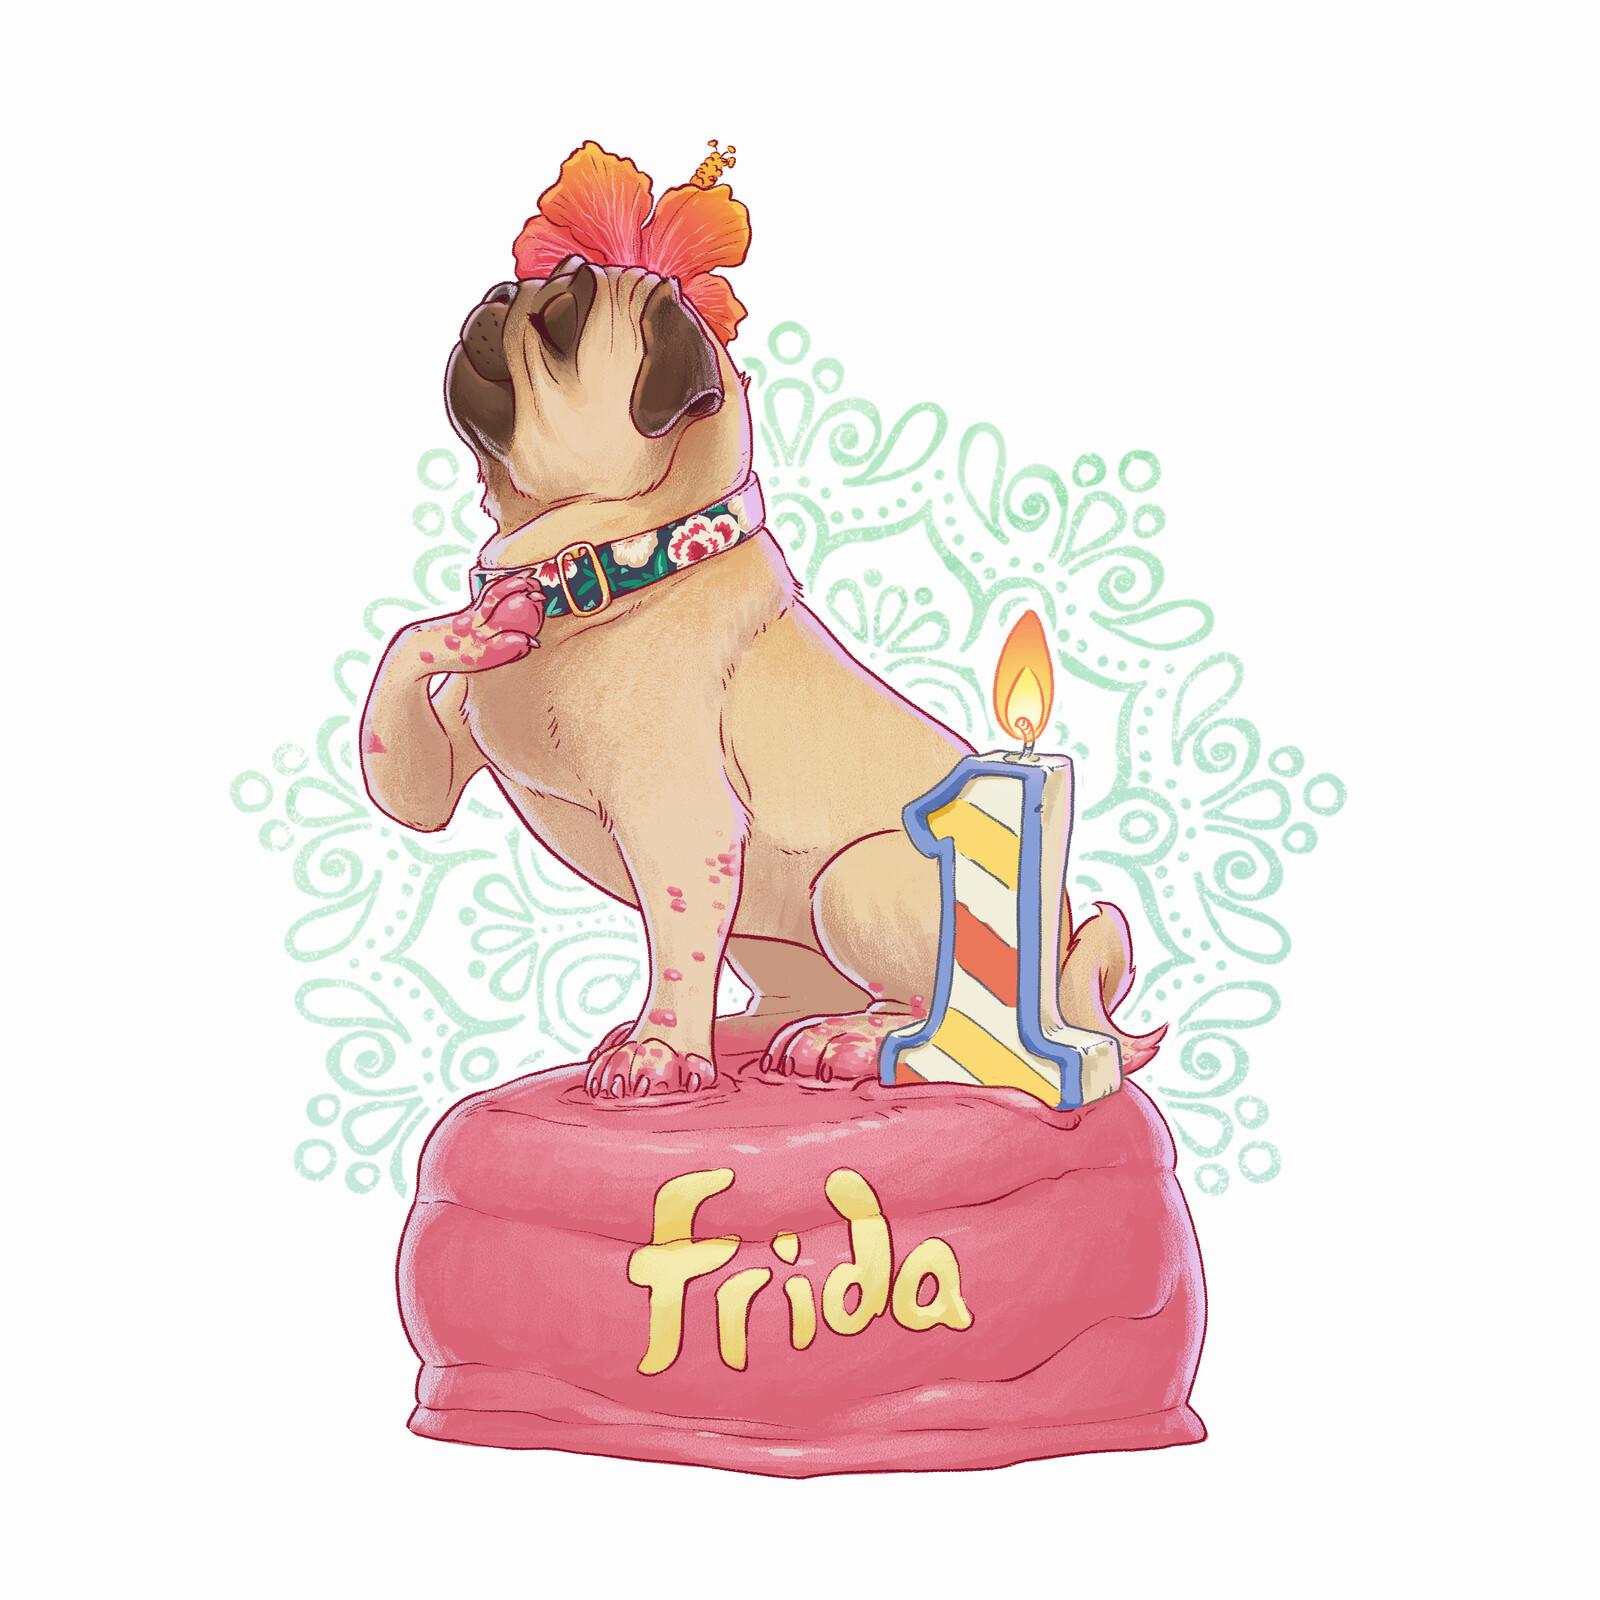 A birthday pug named Frida